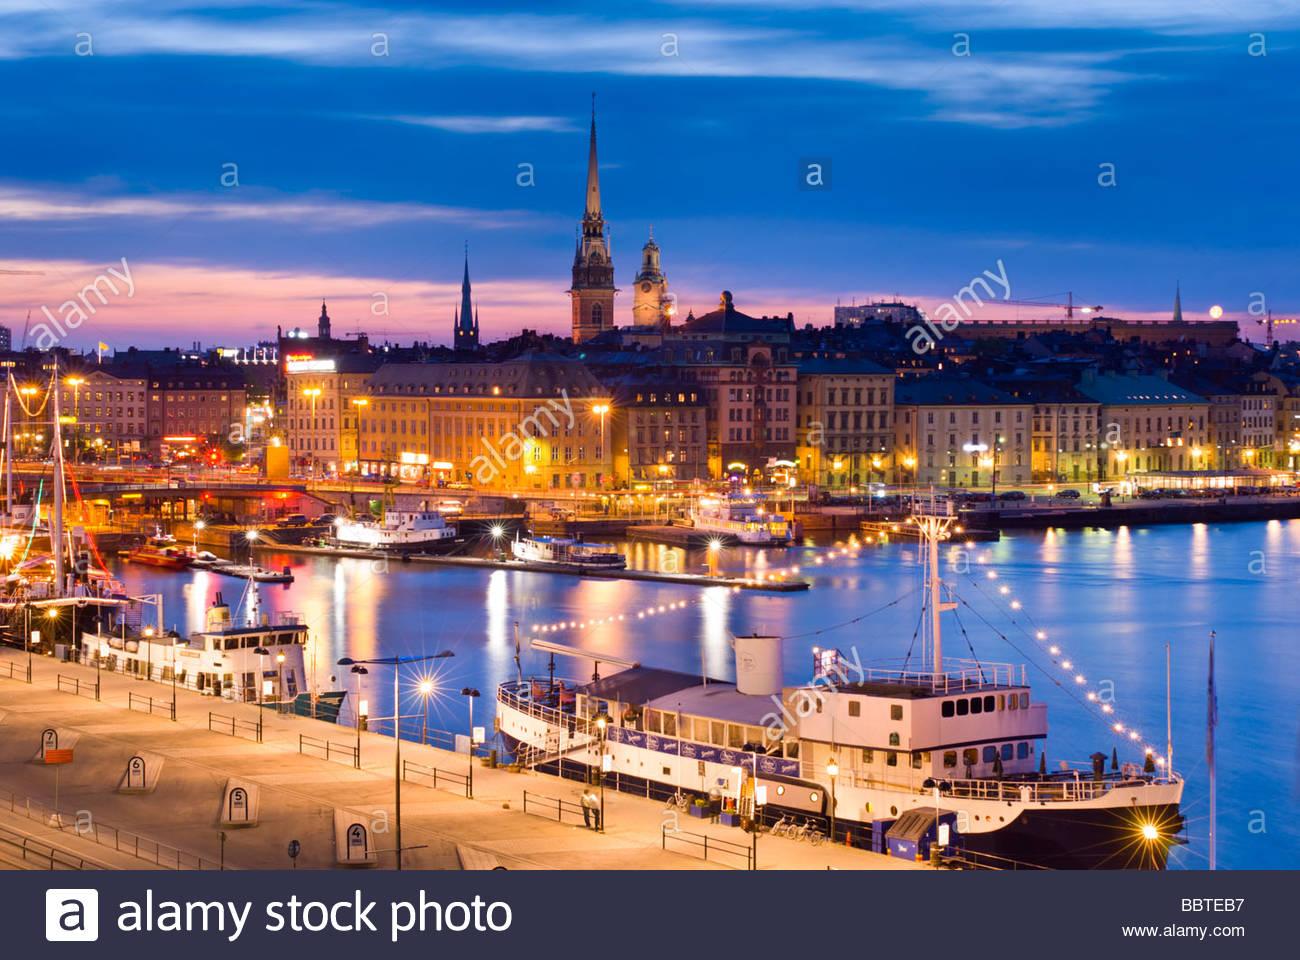 Gamla Stan, the old town of Stockholm, at night, from Katarinavägen, Sweden. - Stock Image